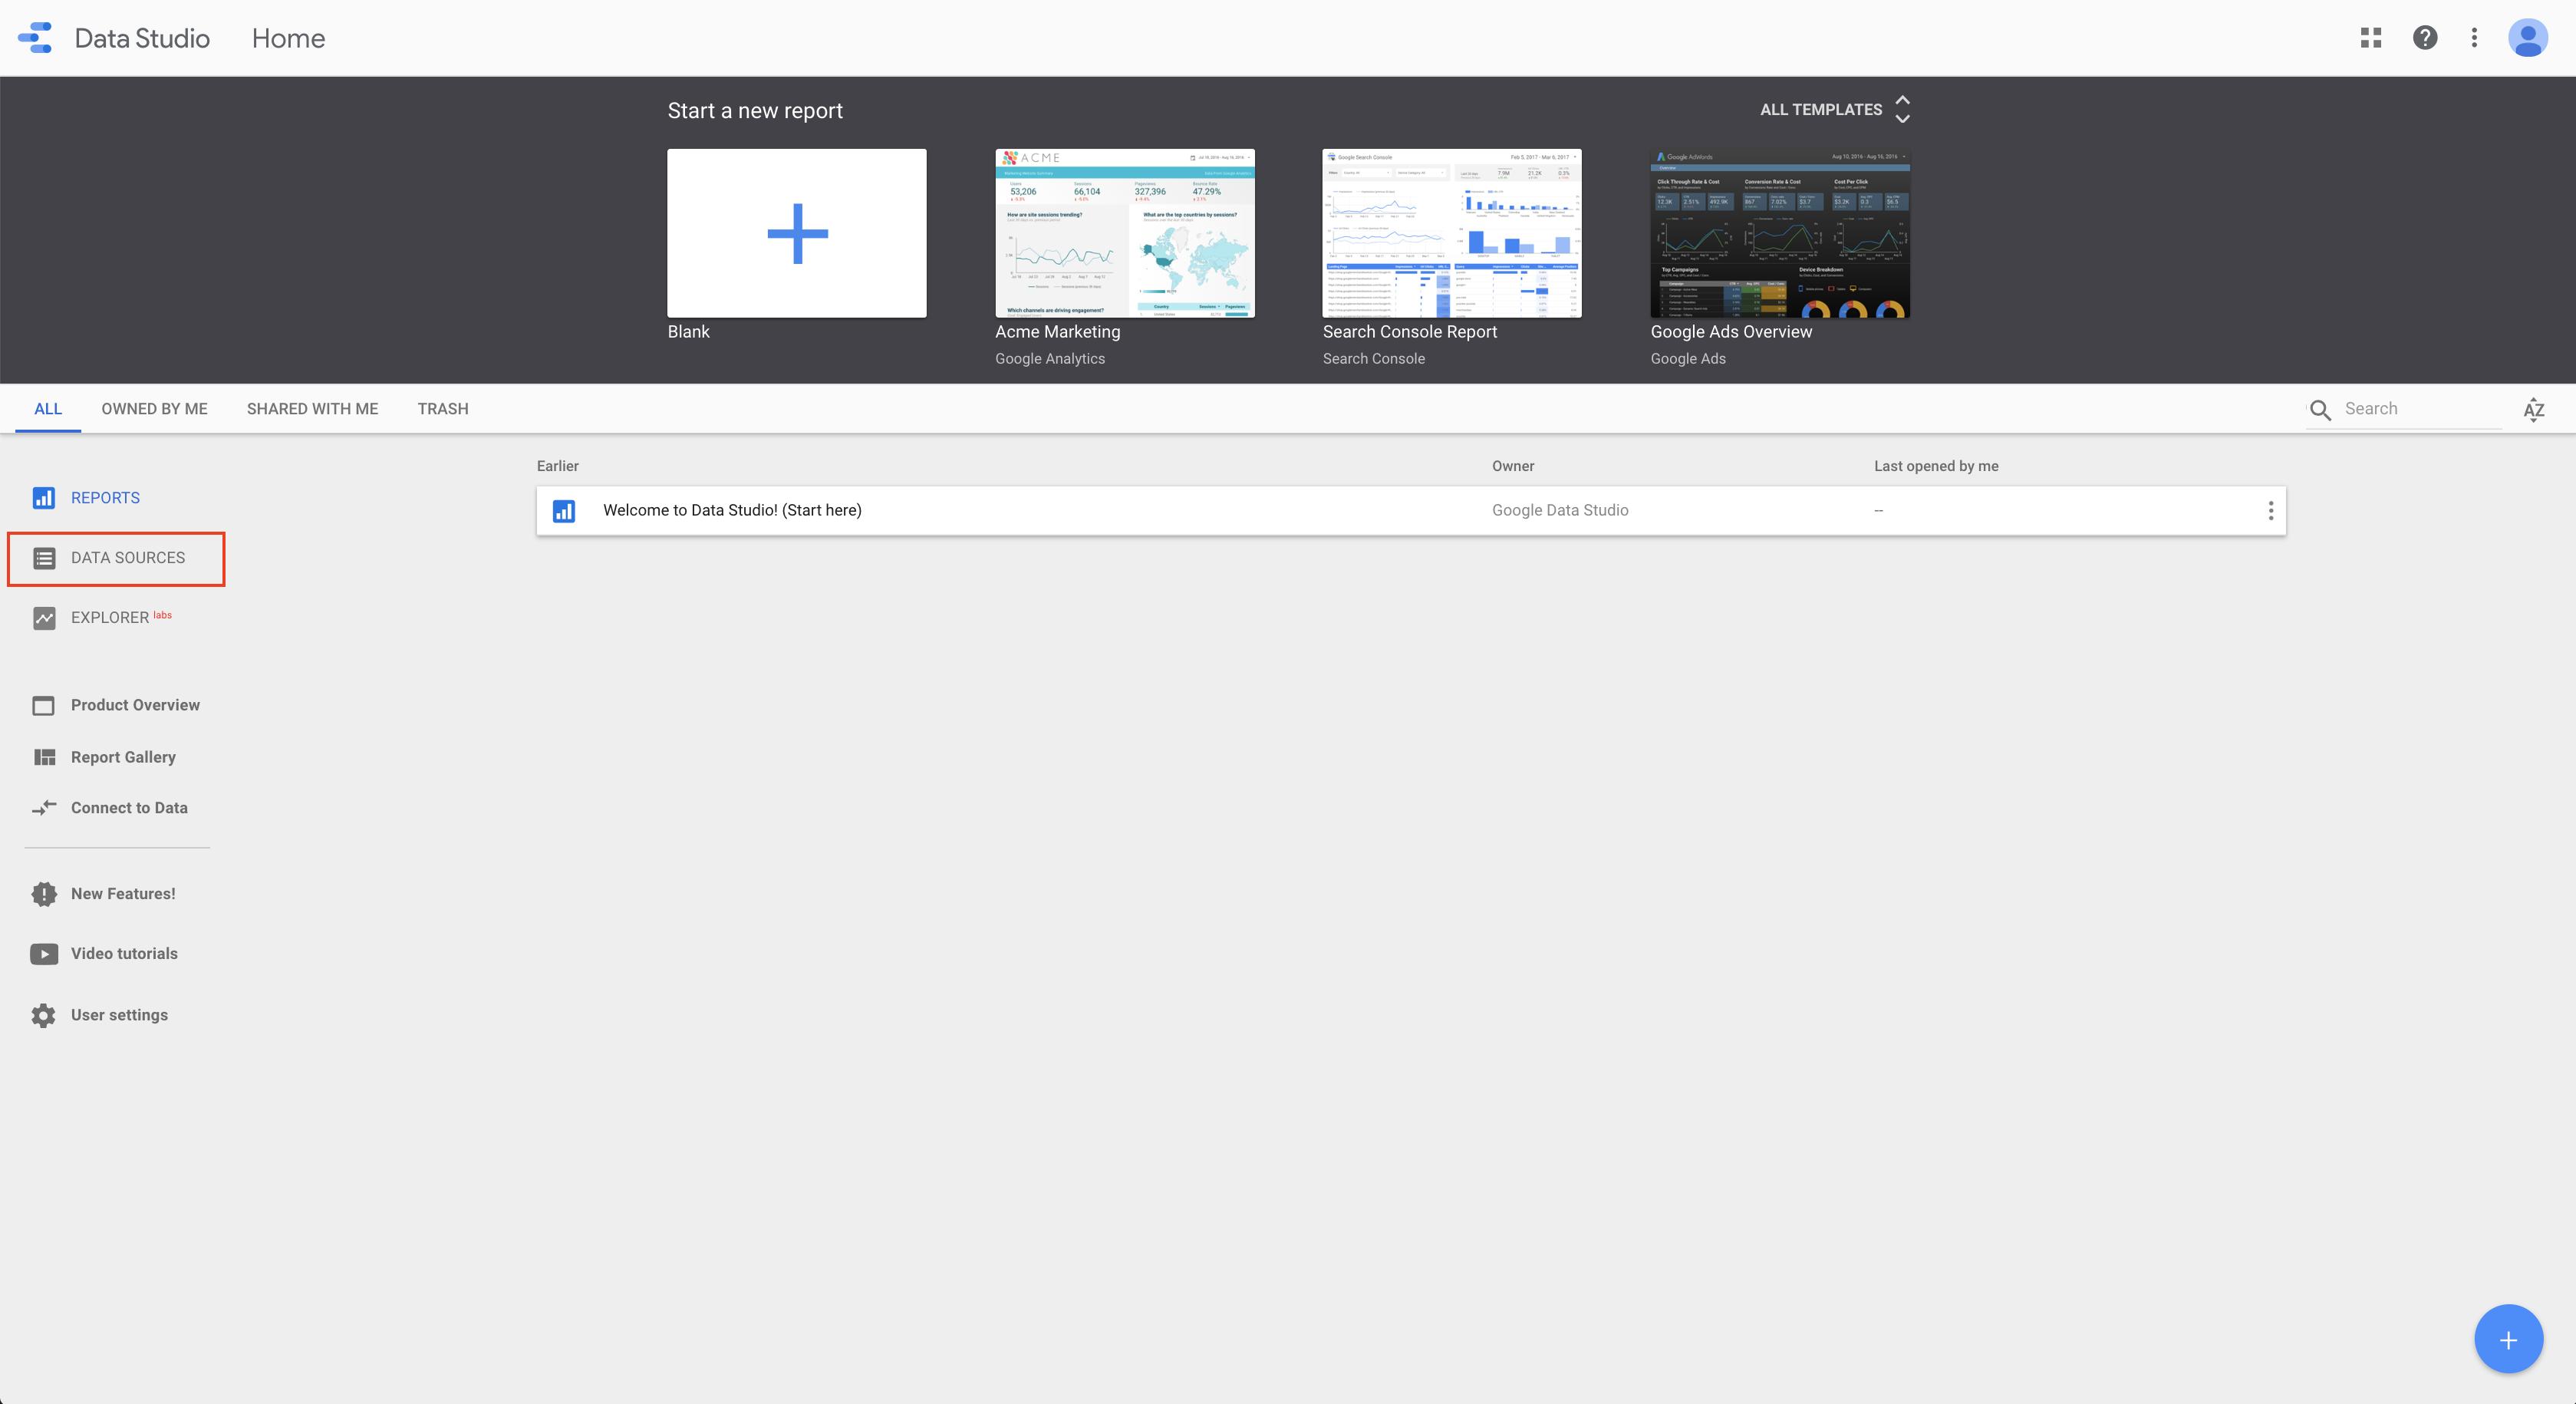 Google data studio welcome